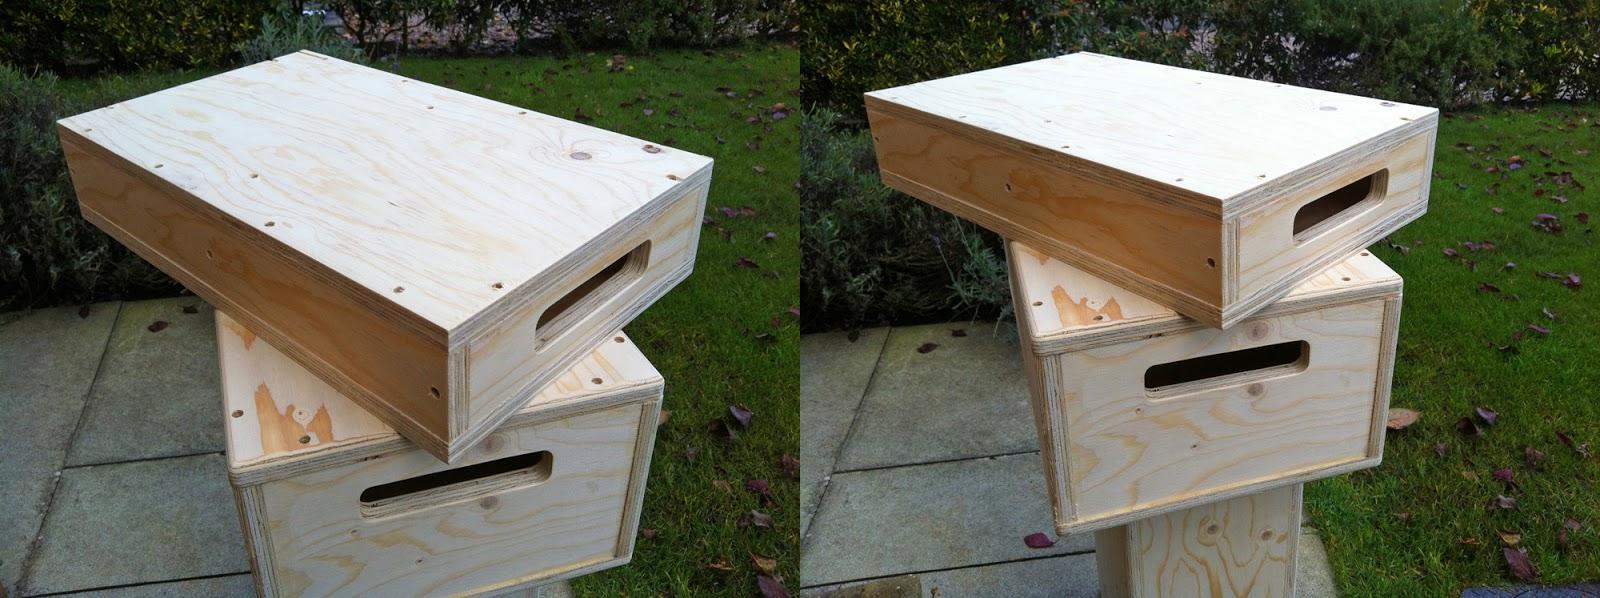 Half apple boxes diy for Diy apple boxes